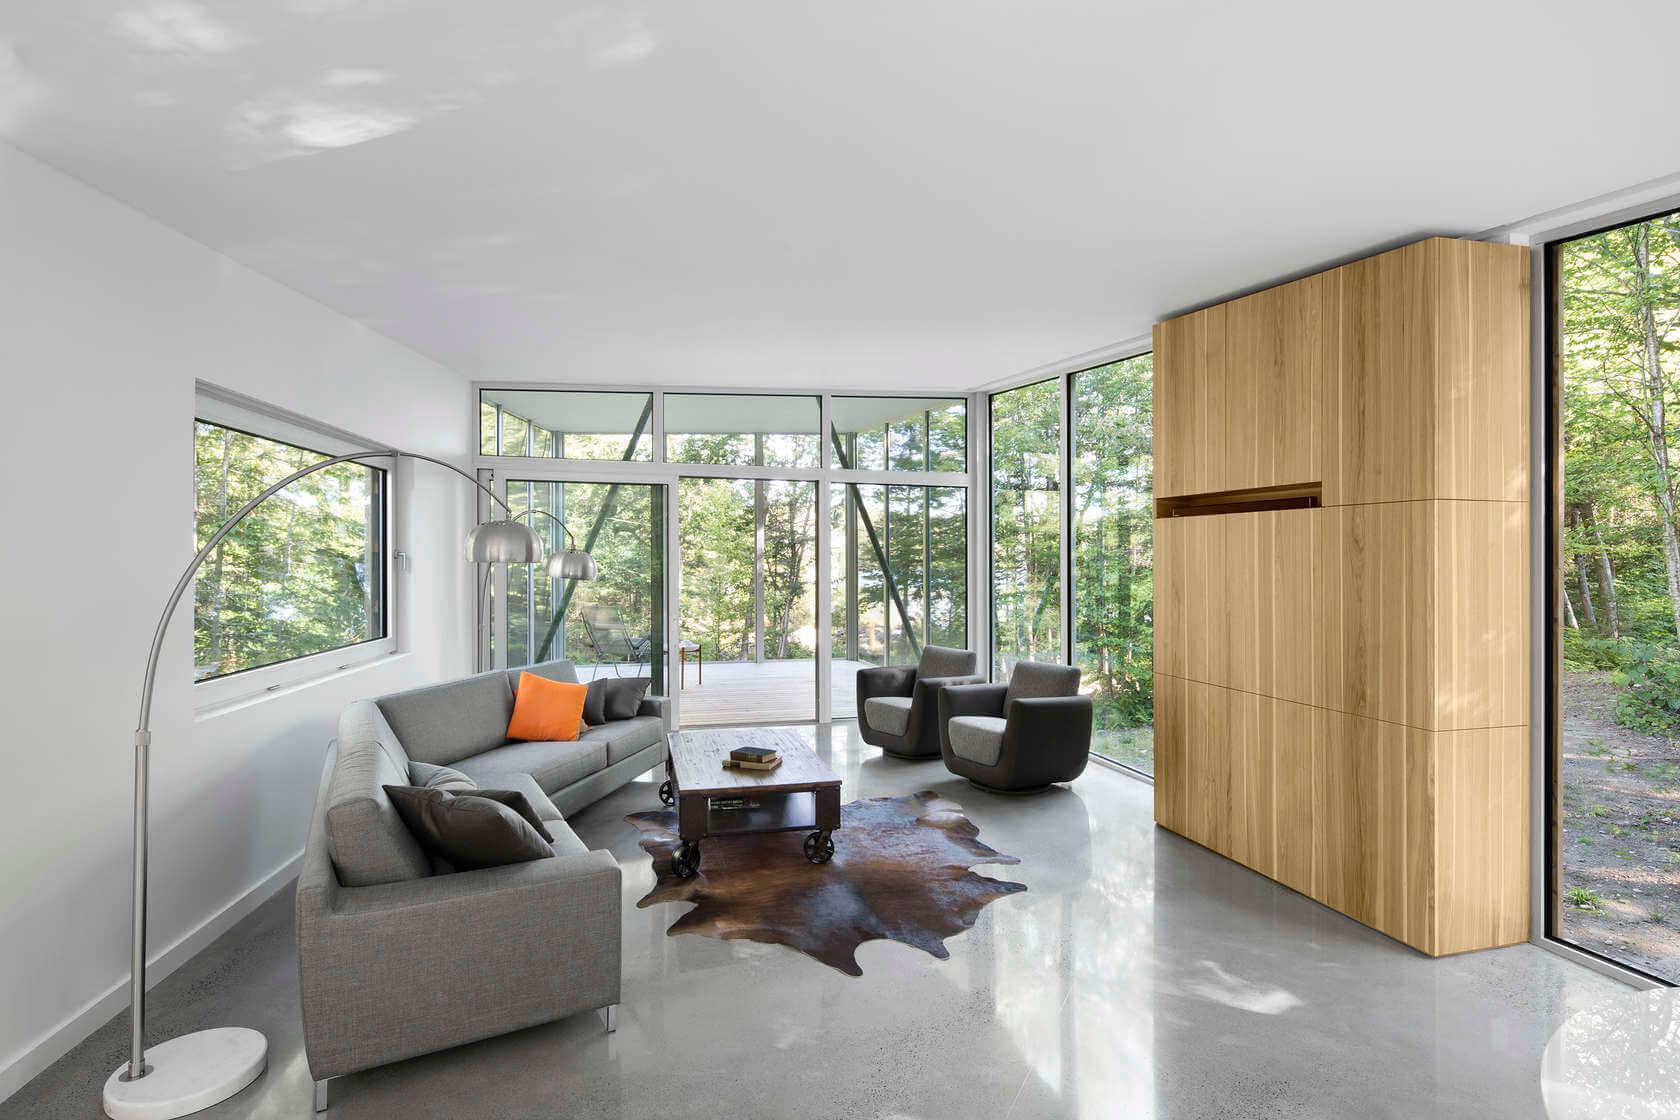 architecture_house_apartment_design_studia_interiors_osnovadesign_osnova_poltava_05